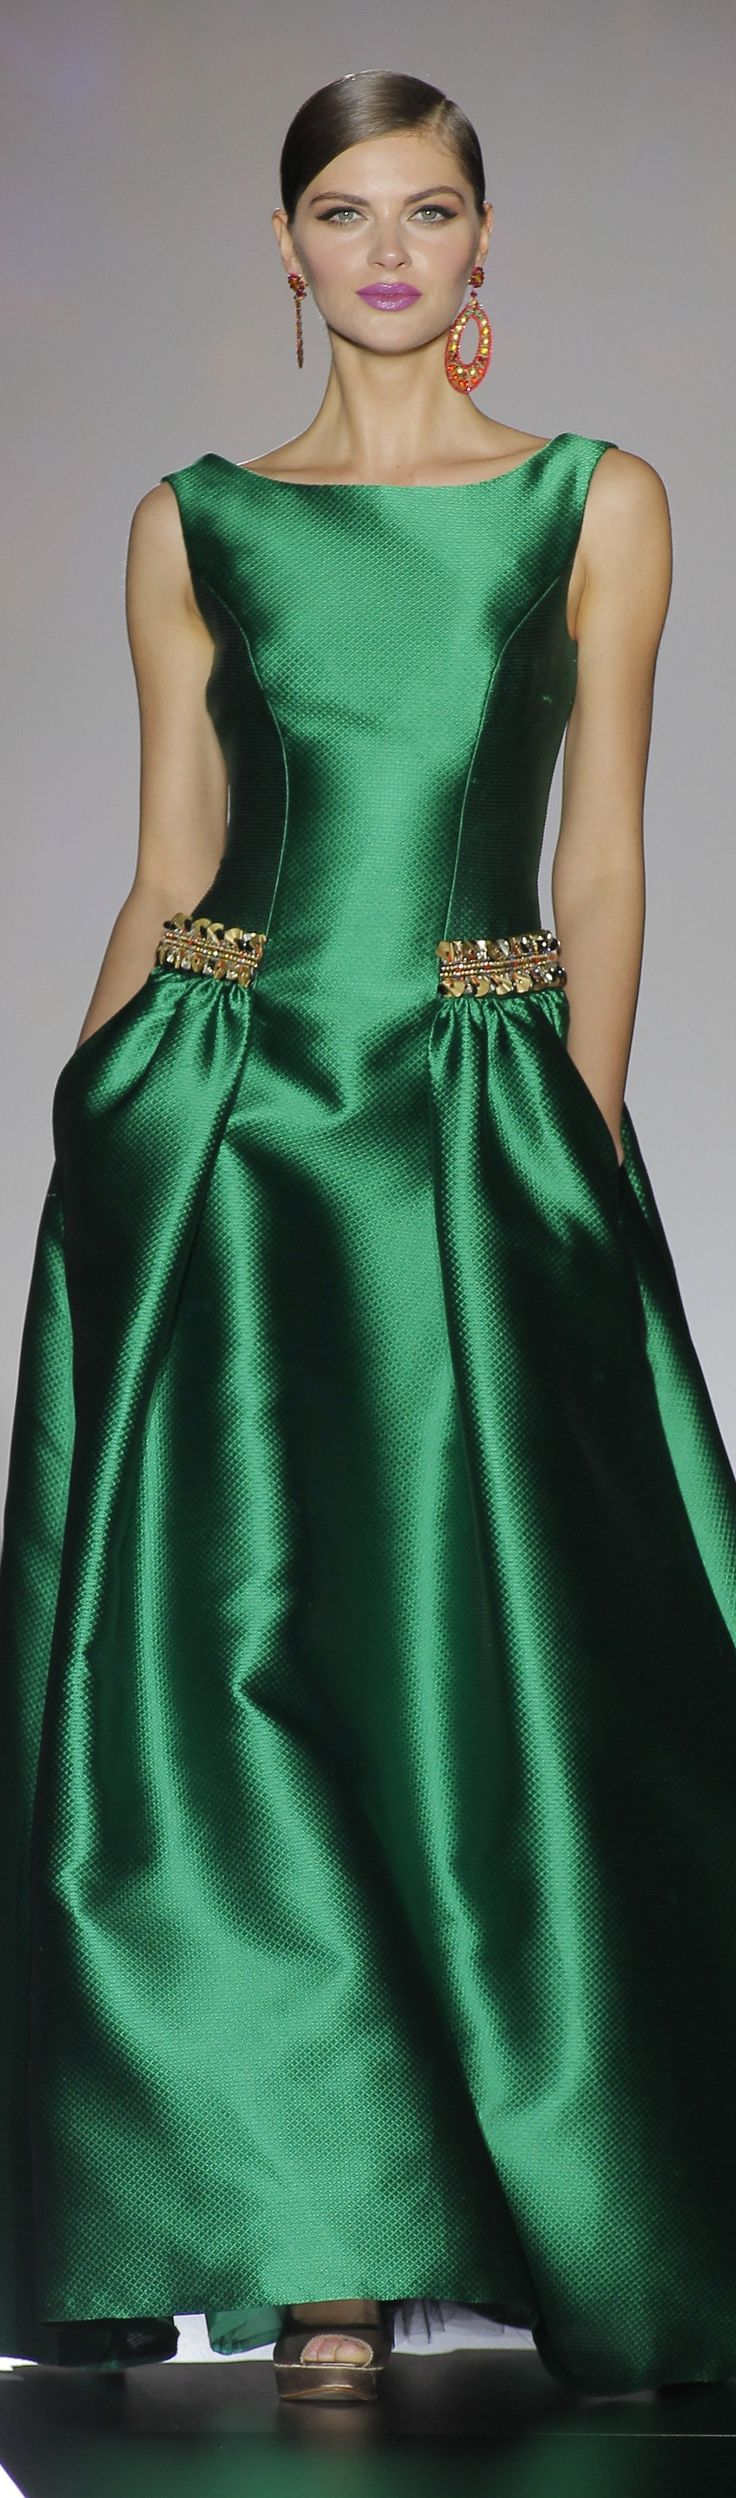 Peeptoe plats, shimmering satin green tank maxi dress w/ golden hip ornamentations, magenta smile, large orange hoop earrings, dark hair gelled back ~ Patricia Avendano